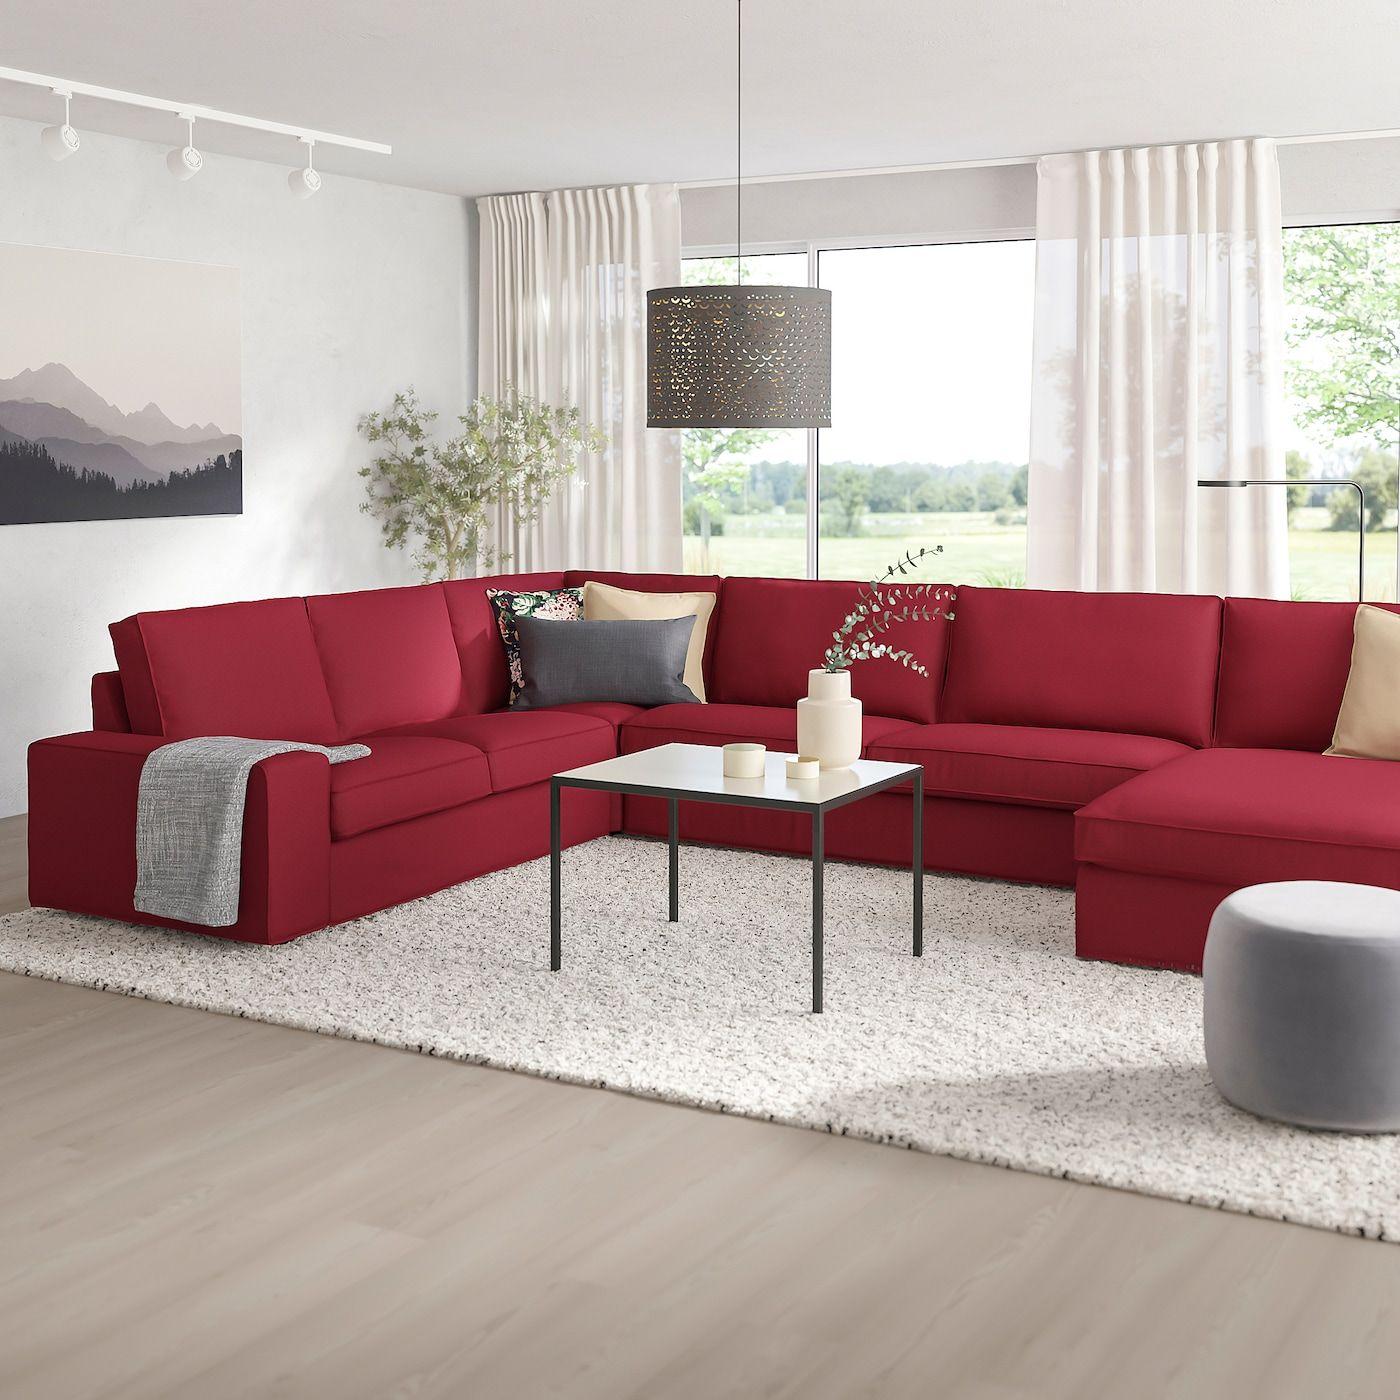 Ikea Kivik Ecksofa 6 Sitzig Mit R Eacute Camiere Orrsta Rot In 2020 Wohnzimmer Farbschema Sofa Ecksofa